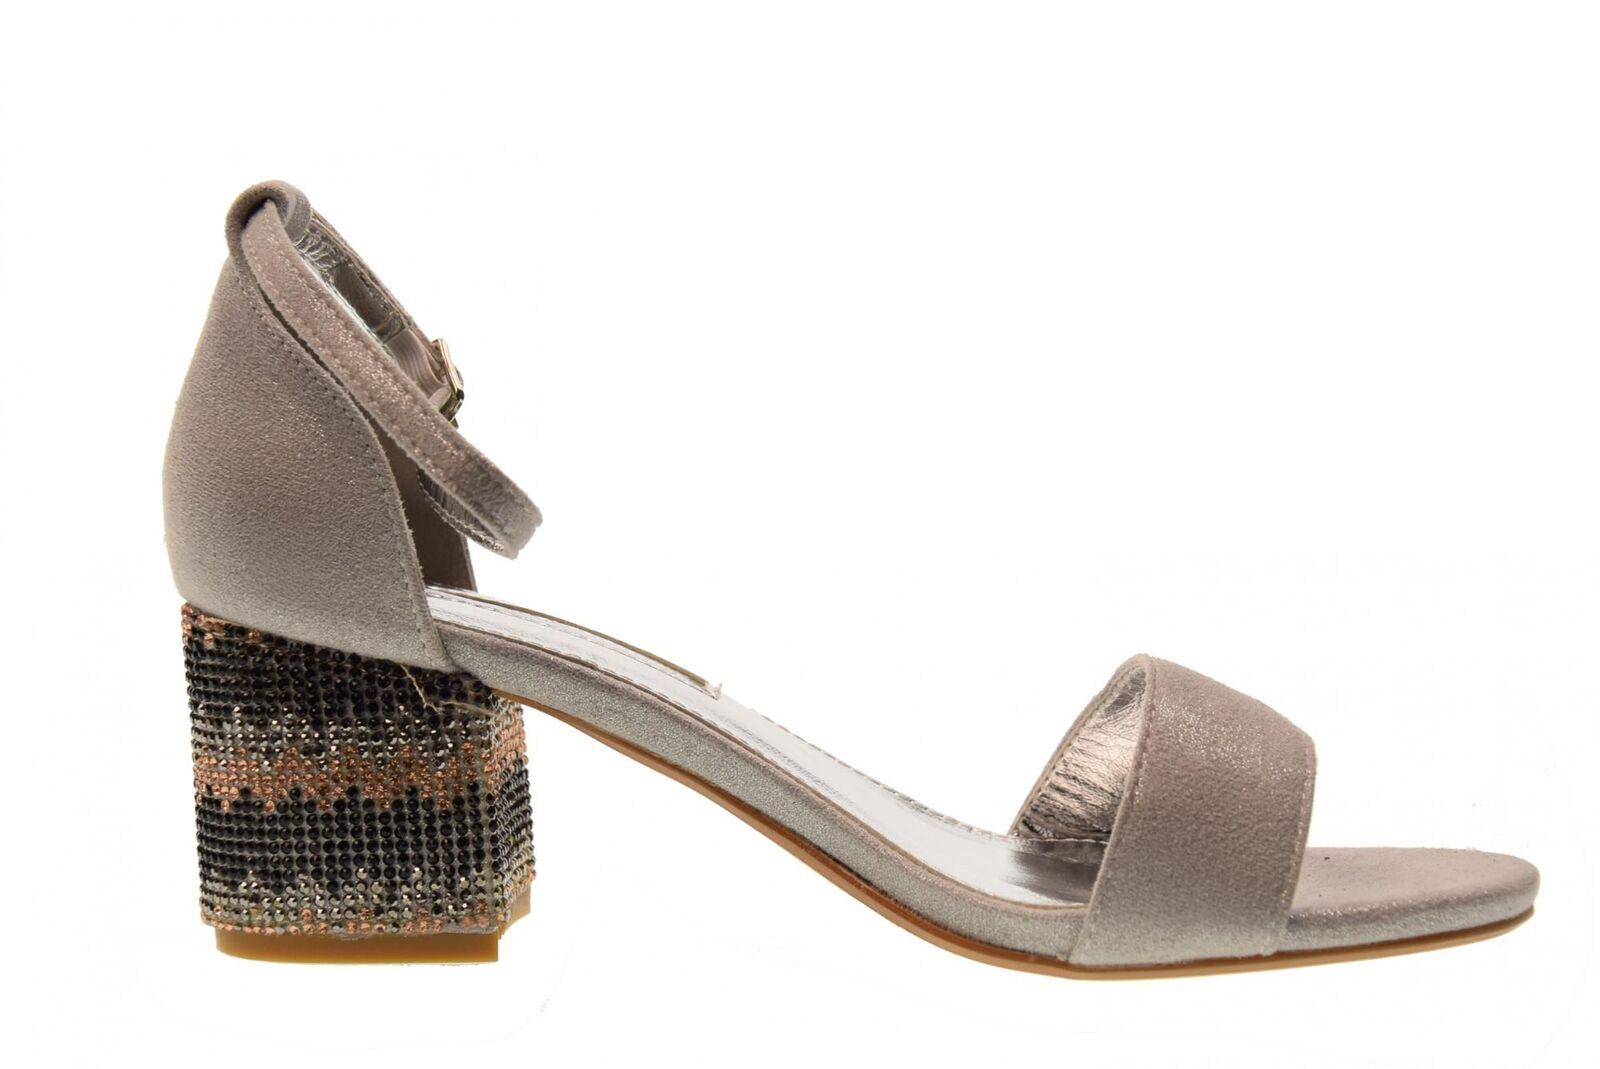 Sandalias Xti Tacón Mujeres Tentations P18us Zapatos Para Bajo oBxWQCder